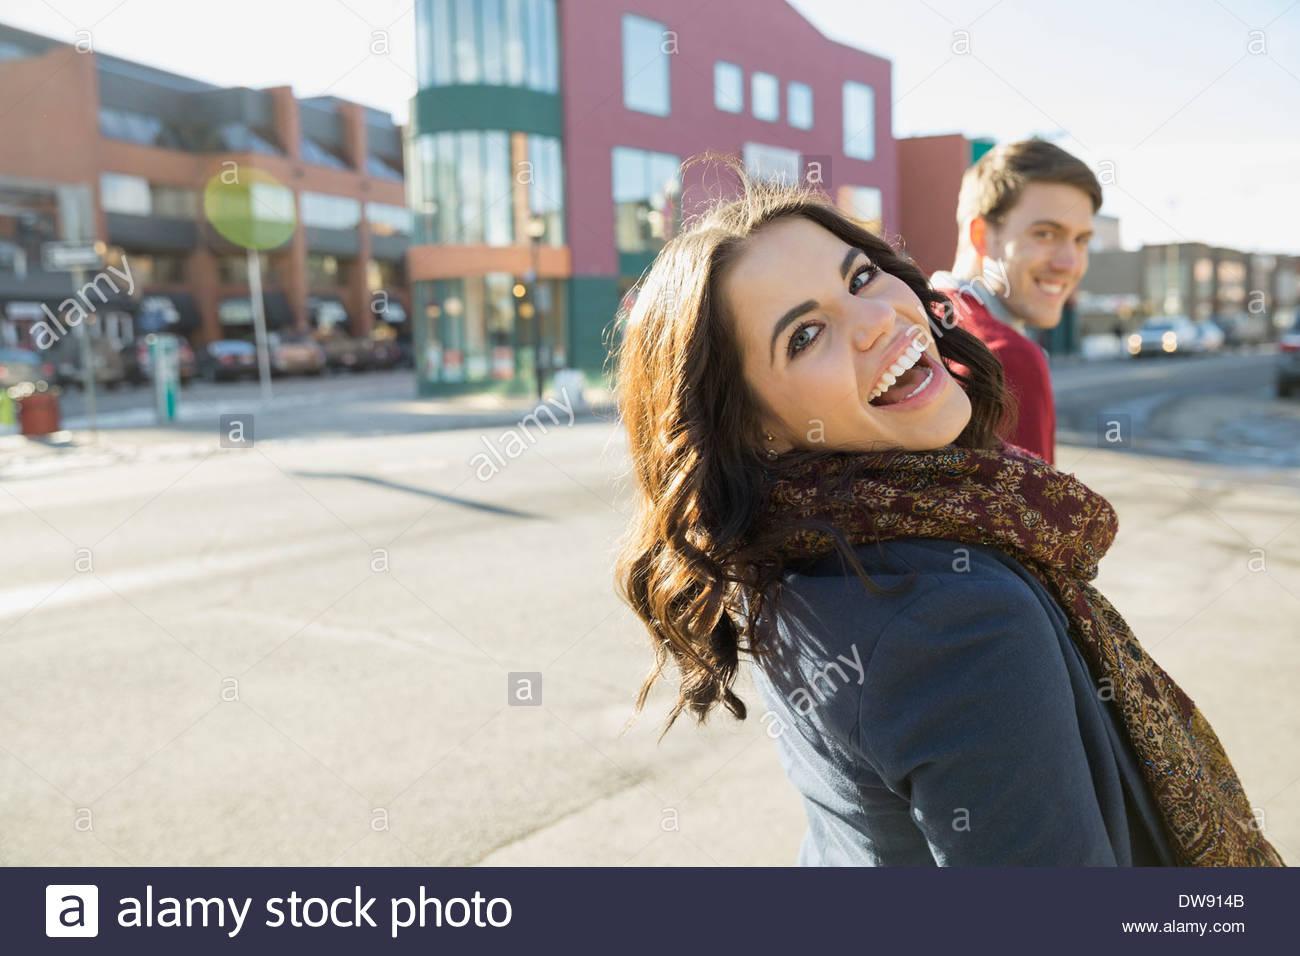 Fröhliche Frau, die im Rückblick auf Stadtstraße Stockbild